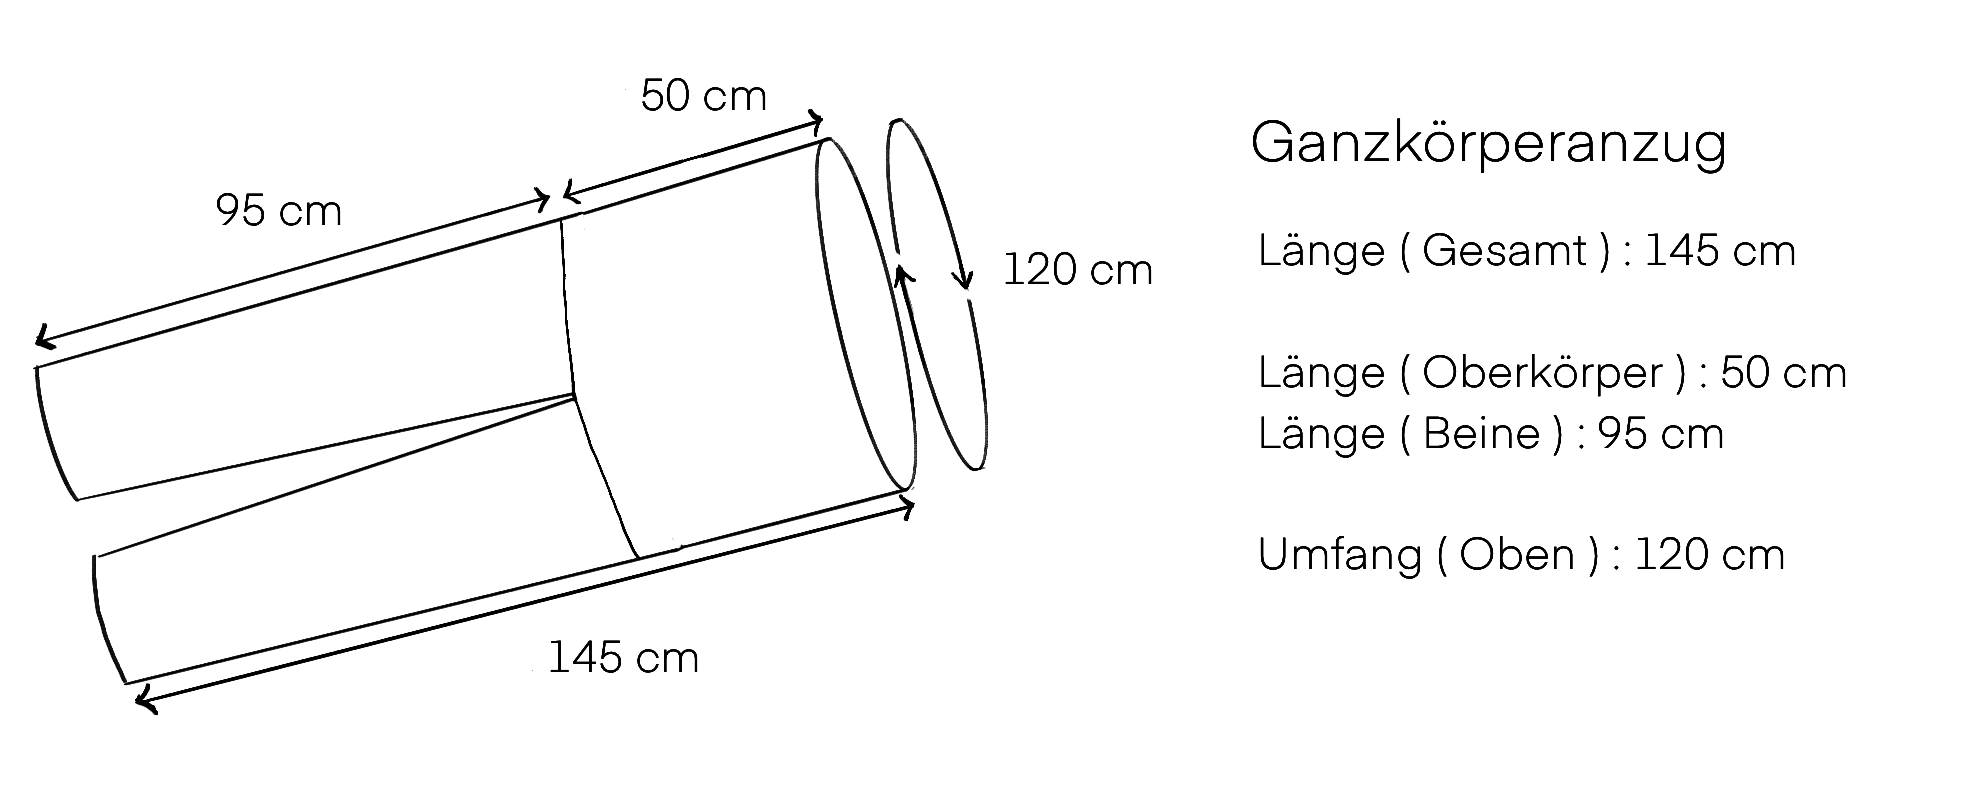 Maße Ganzkörperanzug ( Skizze )